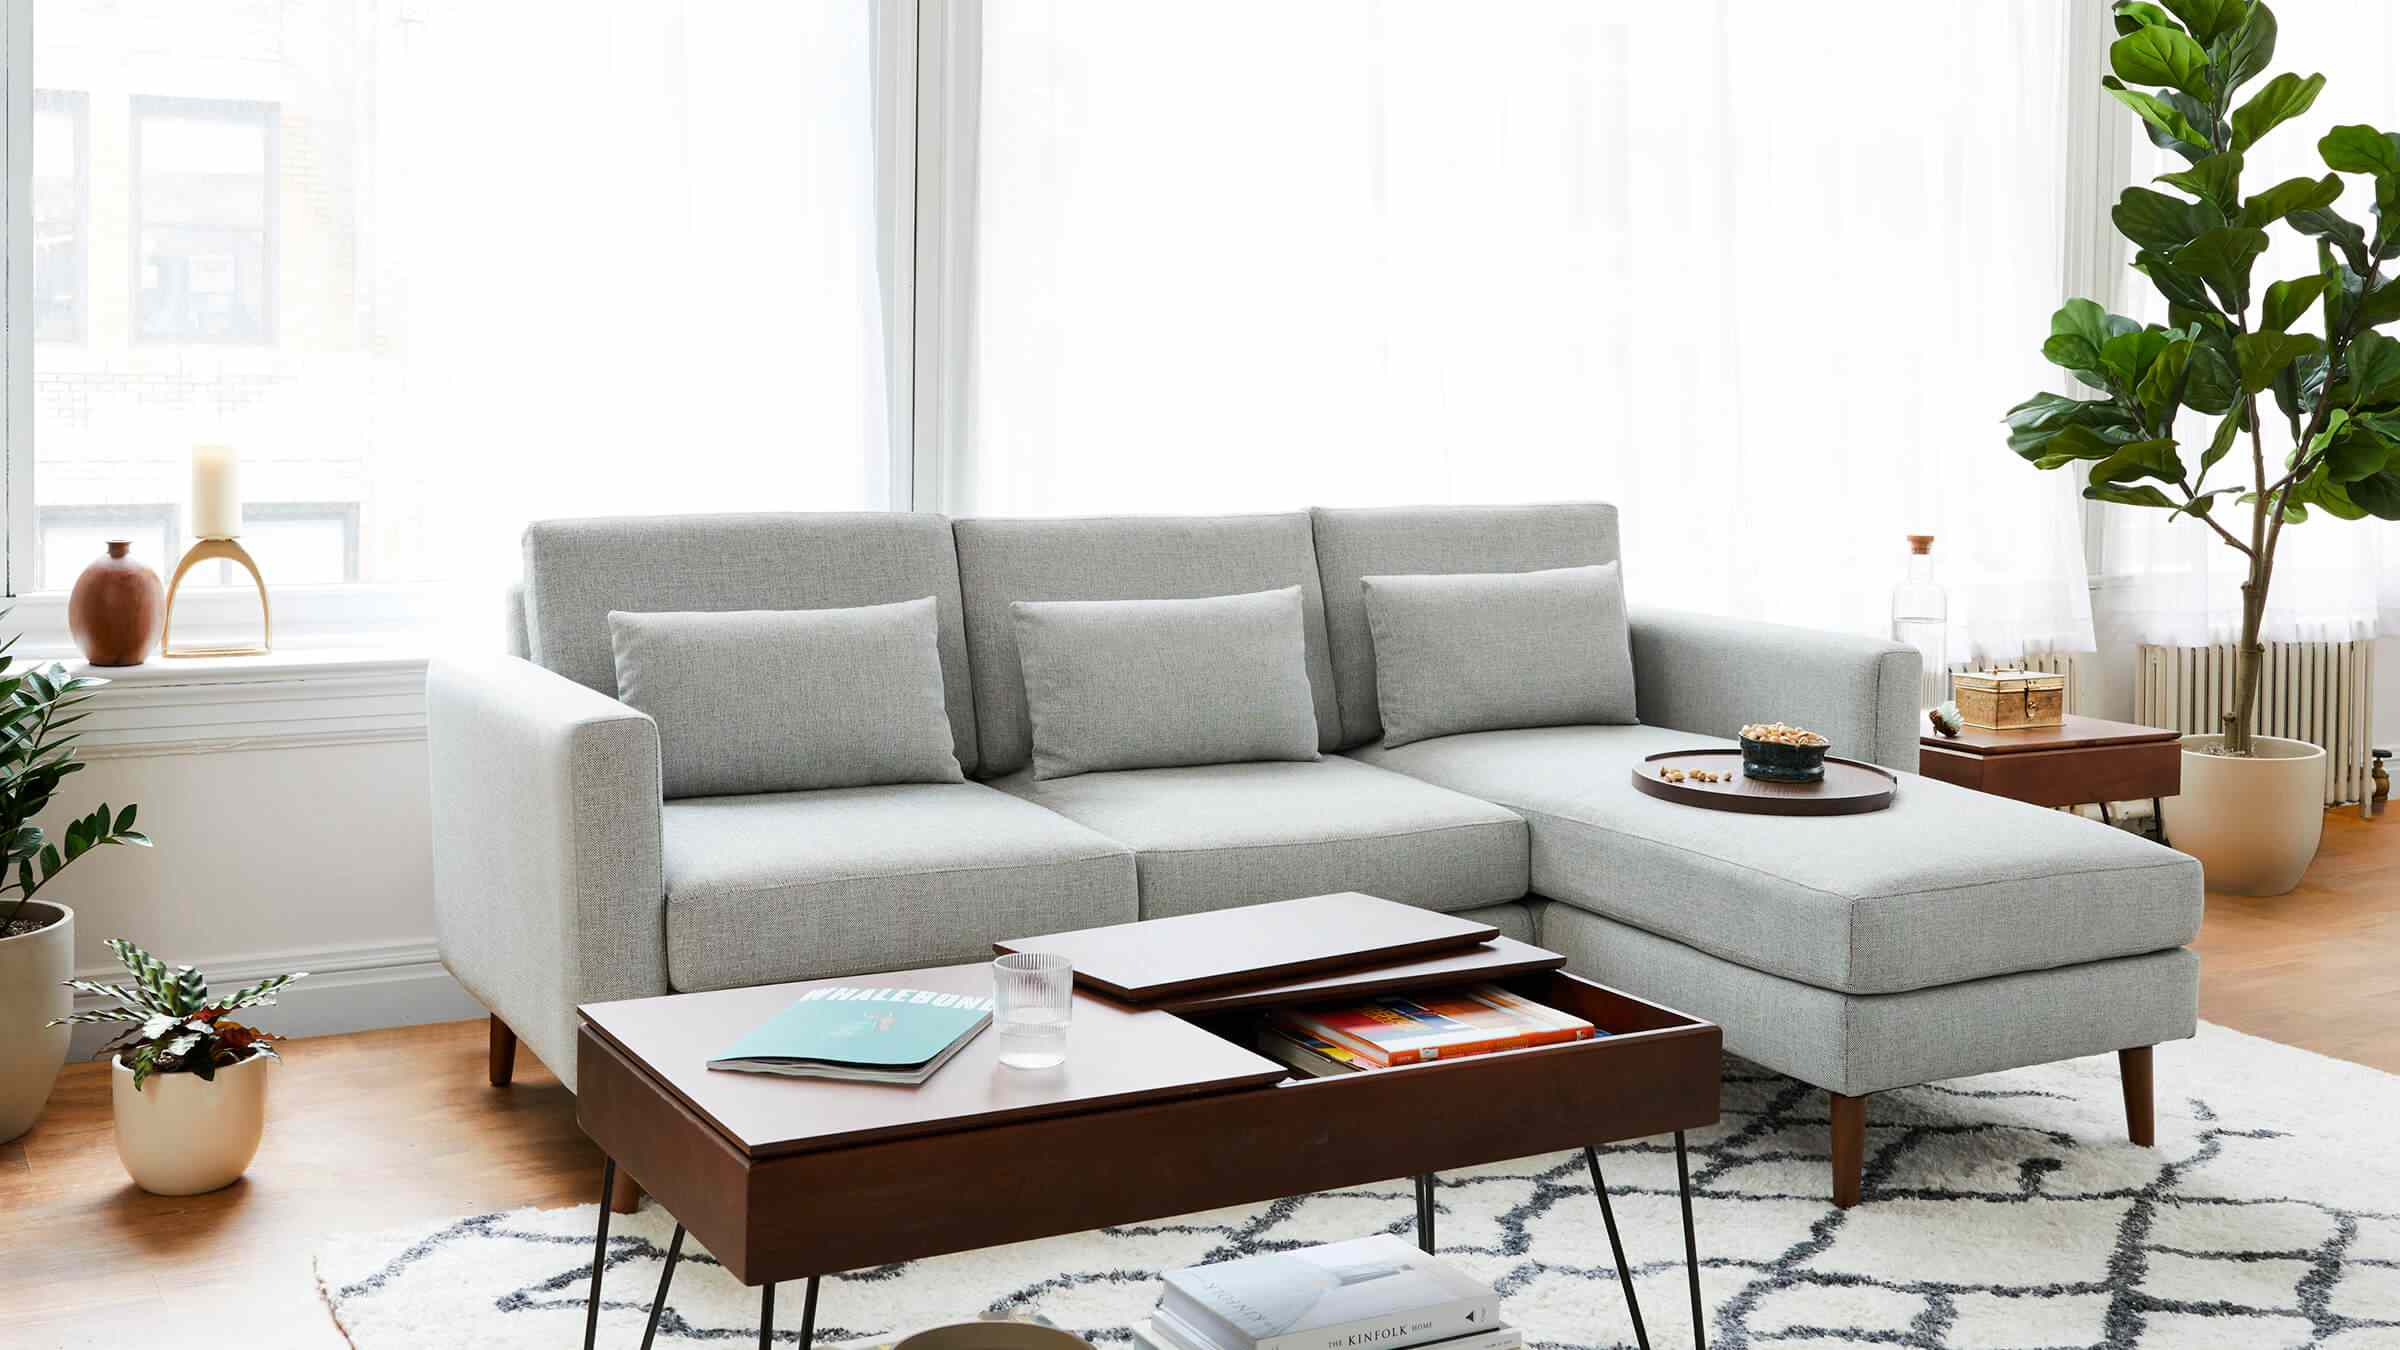 Burrow sofa living room